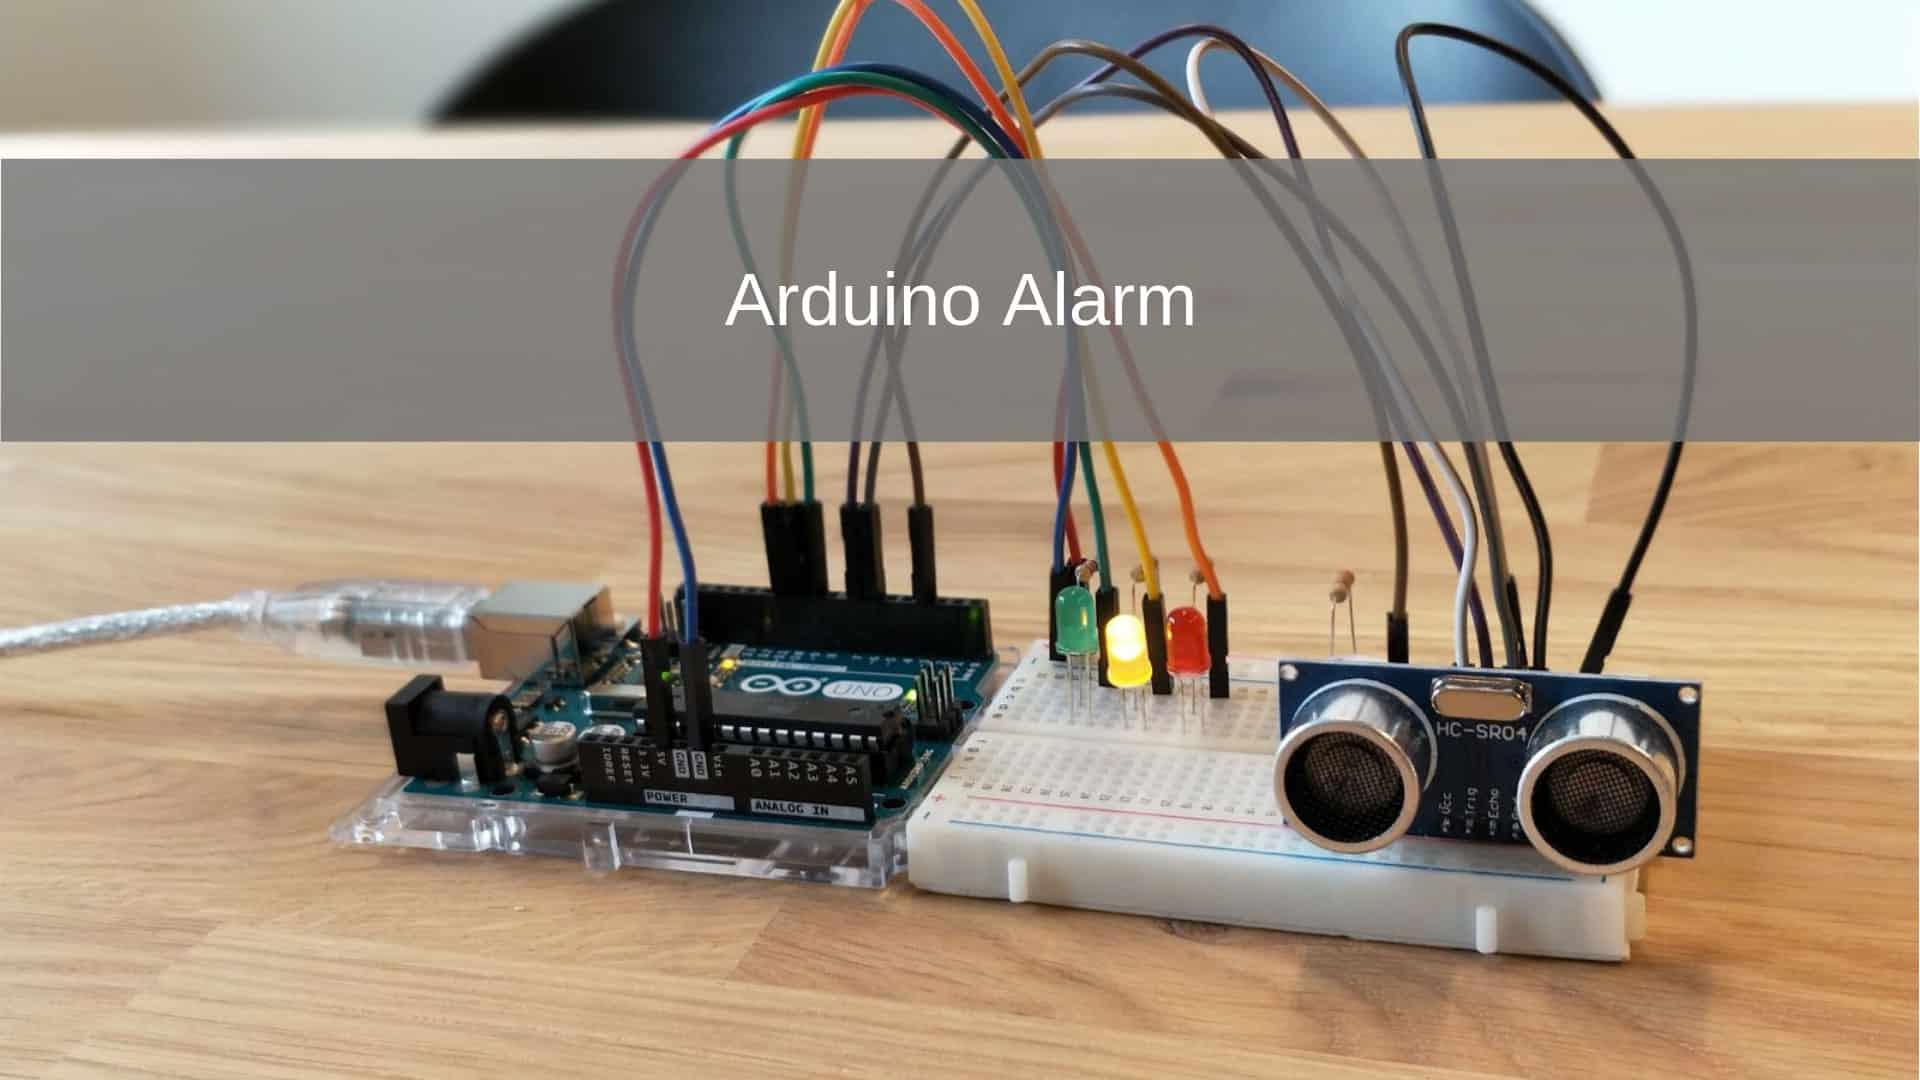 Arduino Alarm project